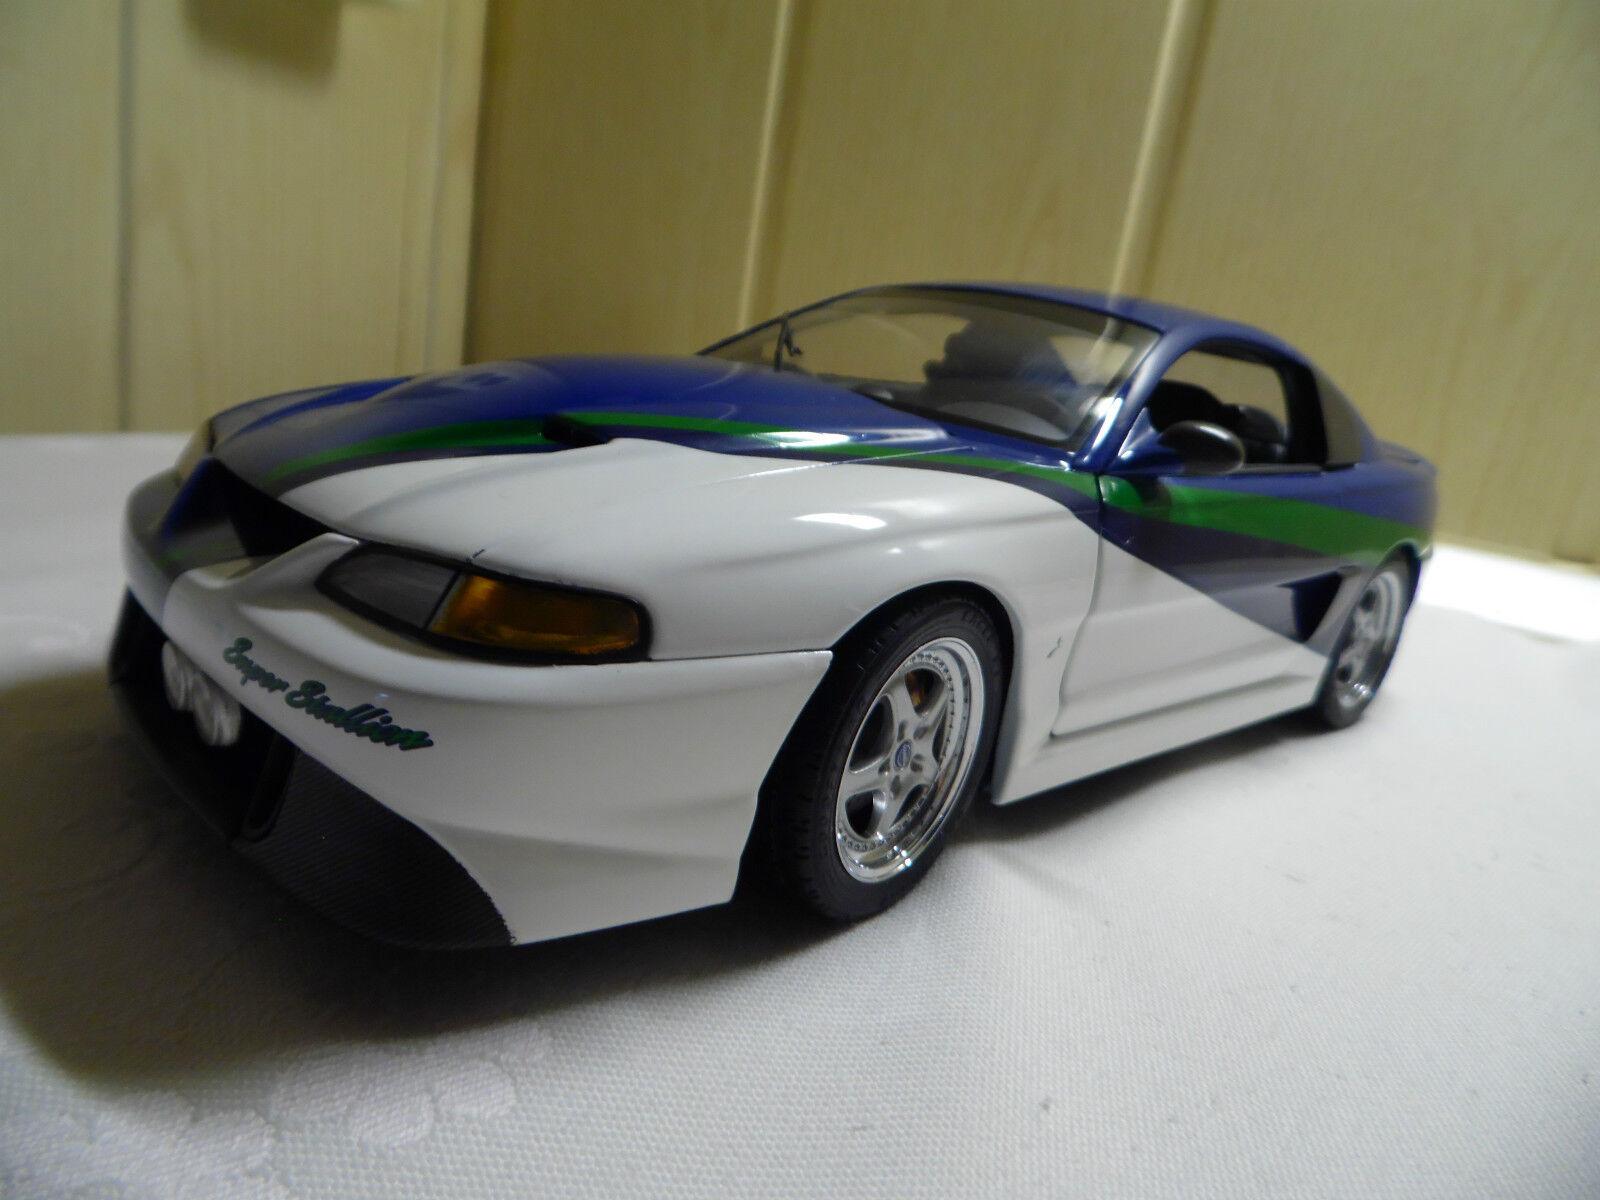 Ford Mustang Super Stallion Auto Art Maßstab 1 18